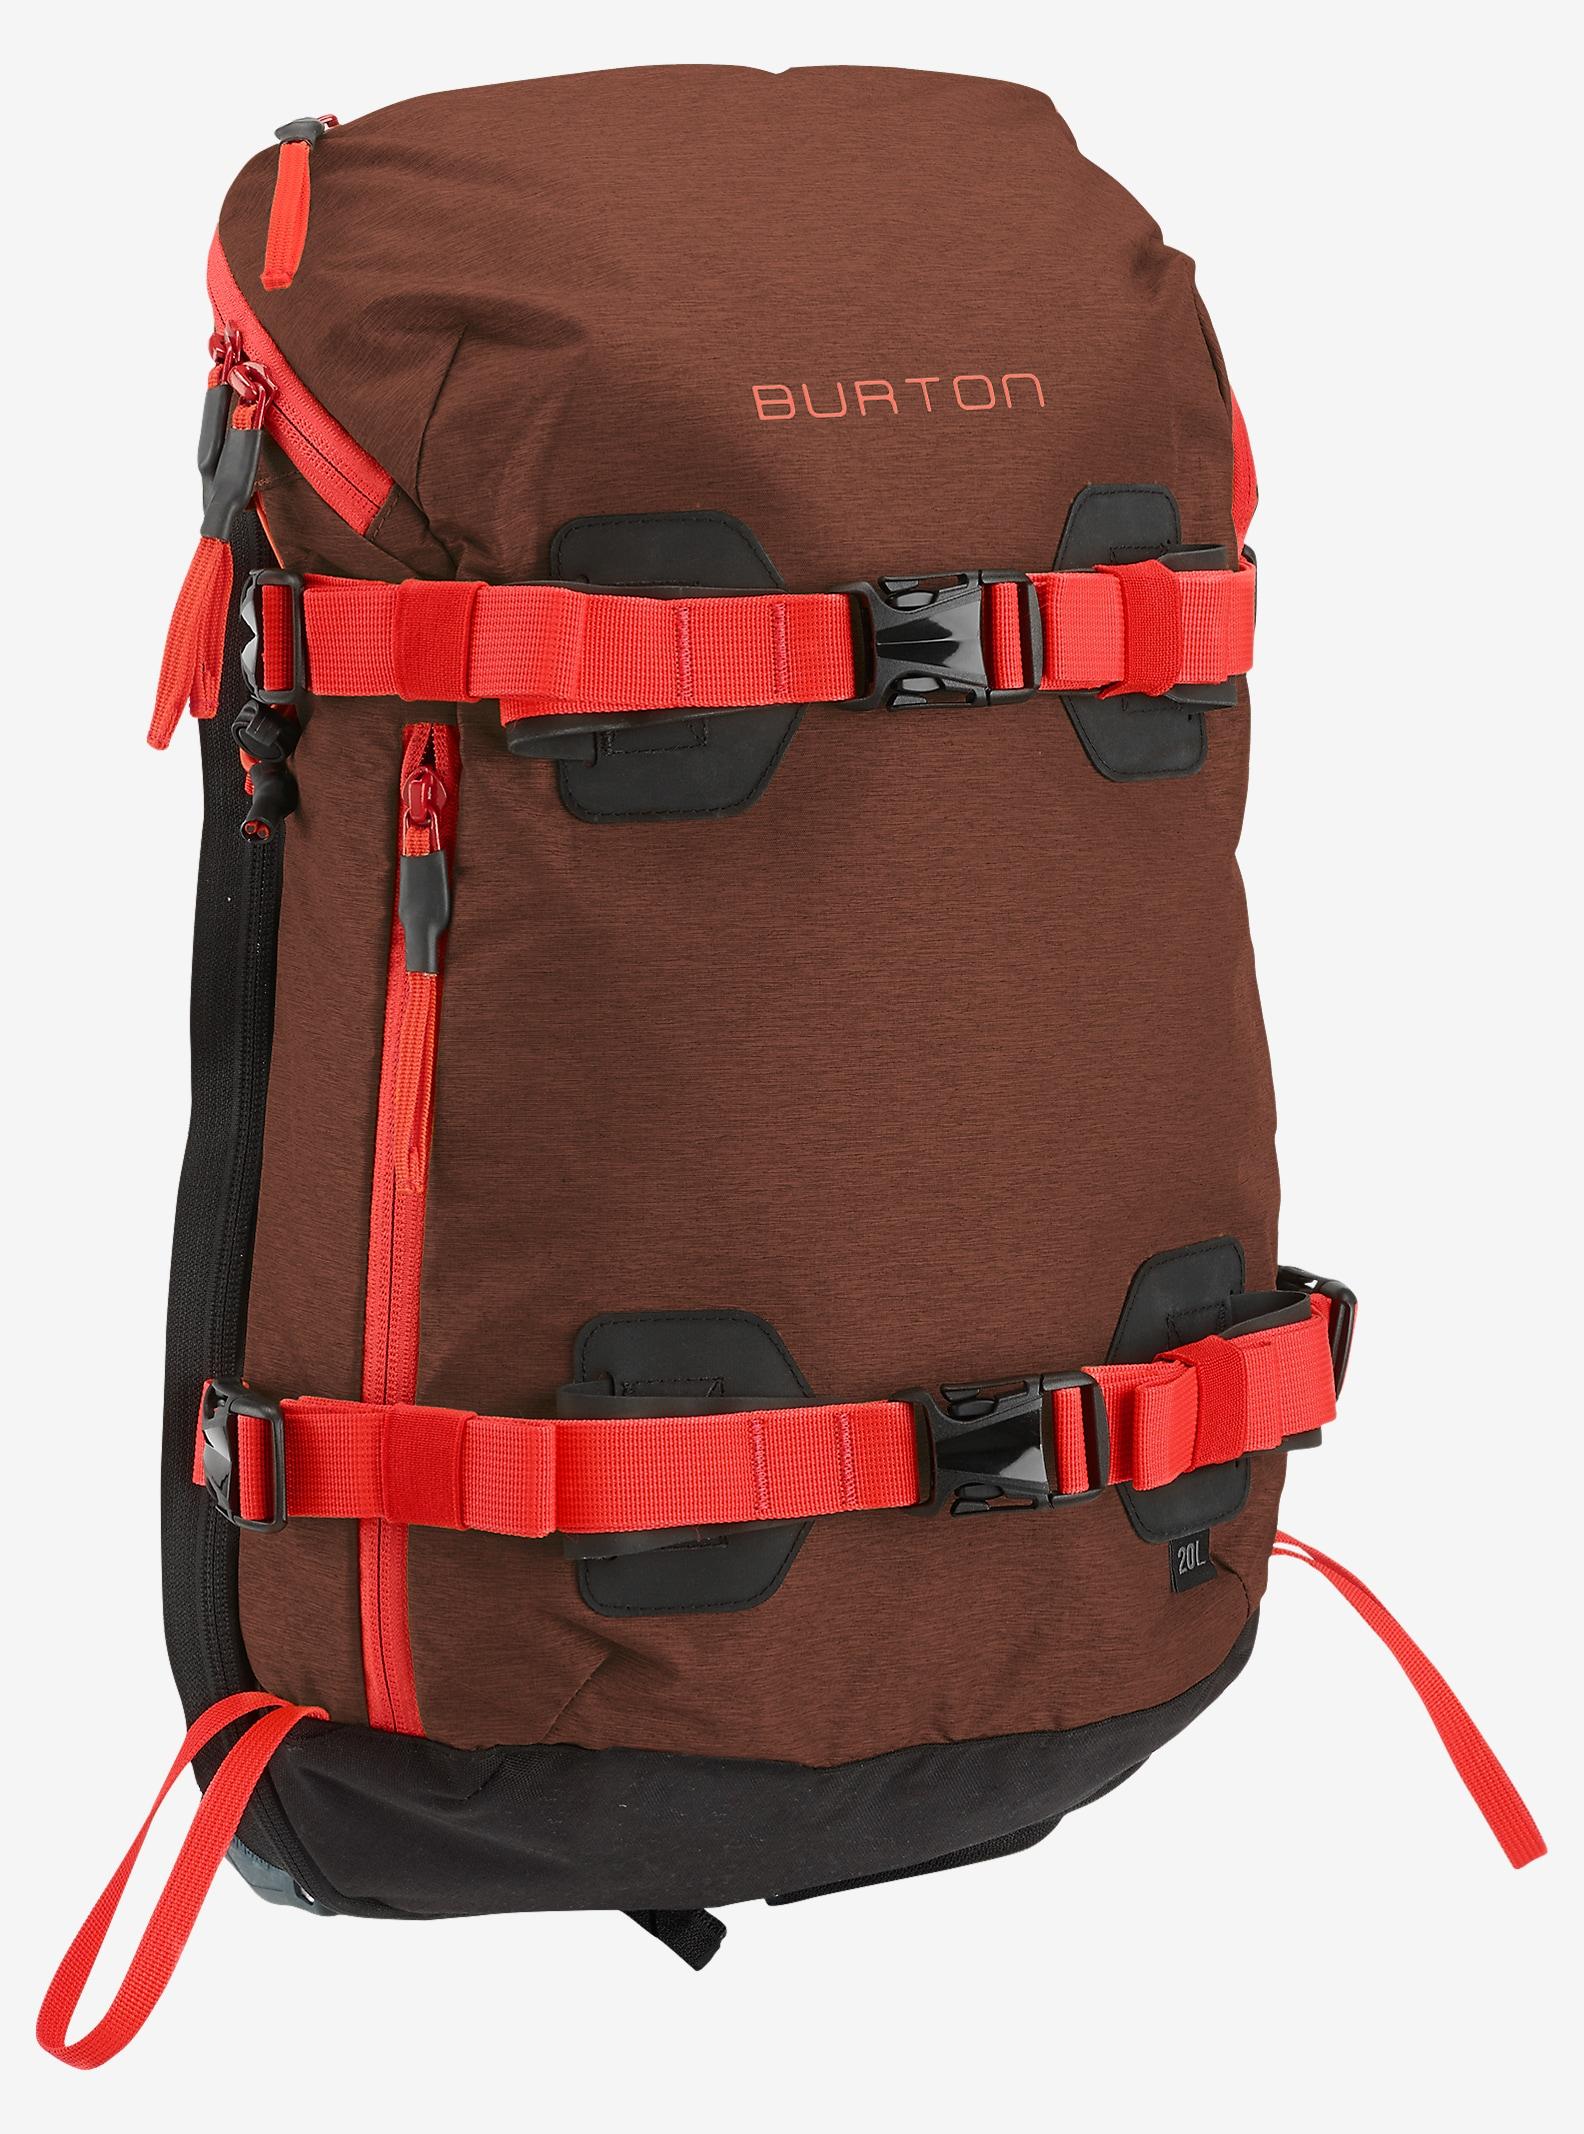 Burton Women's 20L Backpack shown in Matador Heather Cordura®